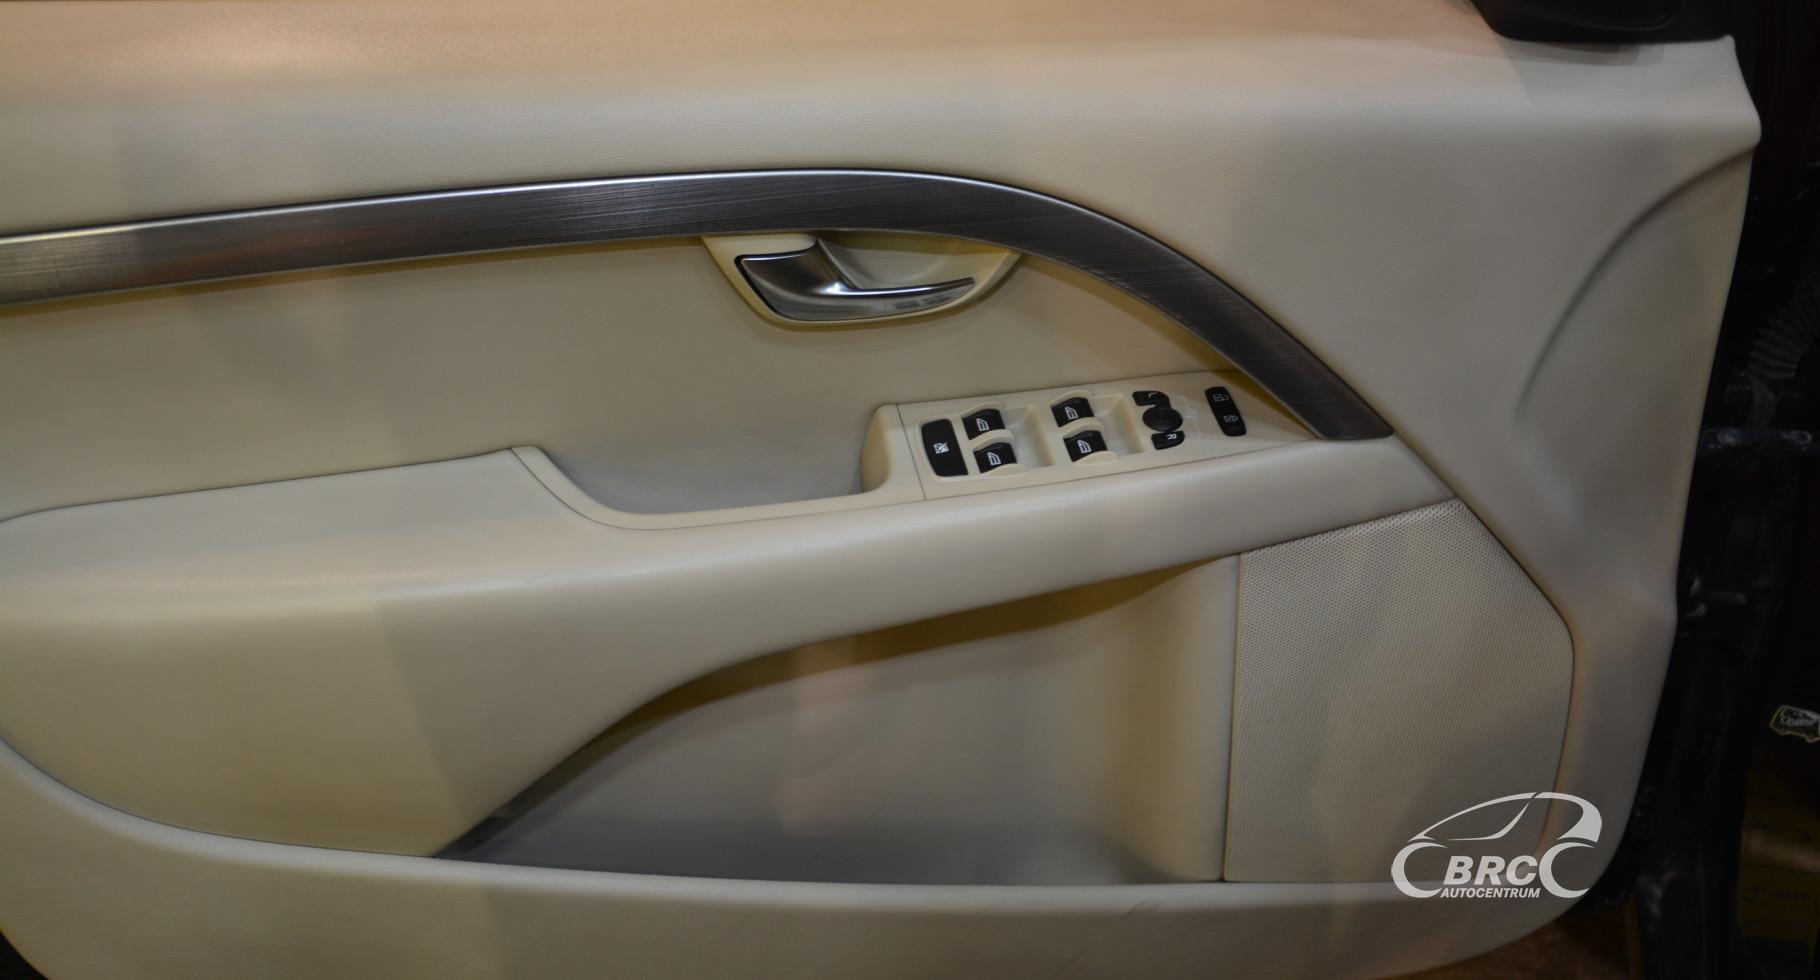 Volvo V70 2.4 D5 Automatas